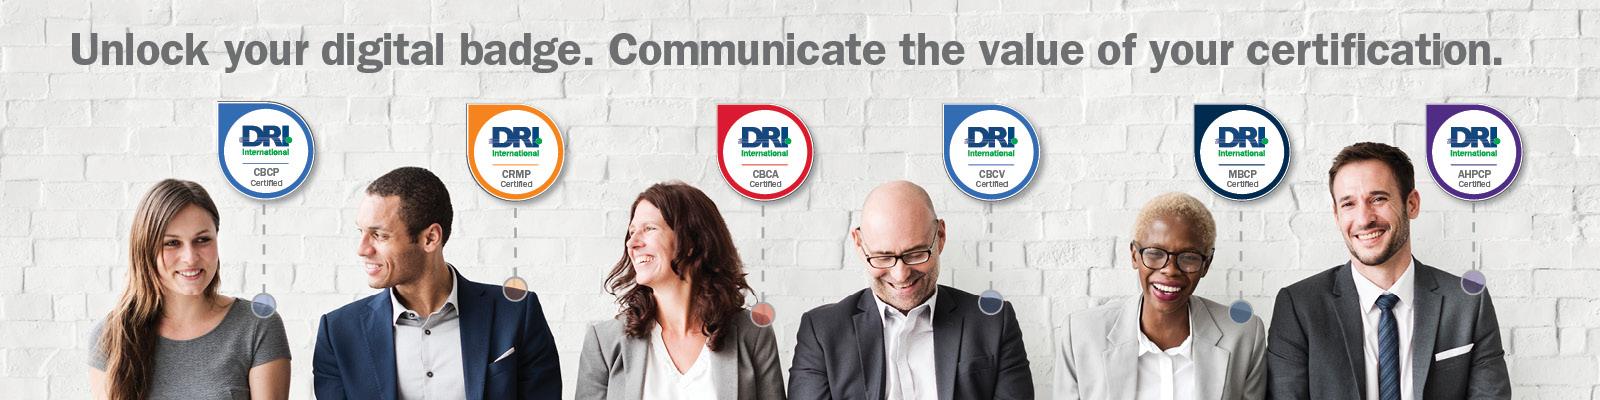 Learn about DRI digital badges!